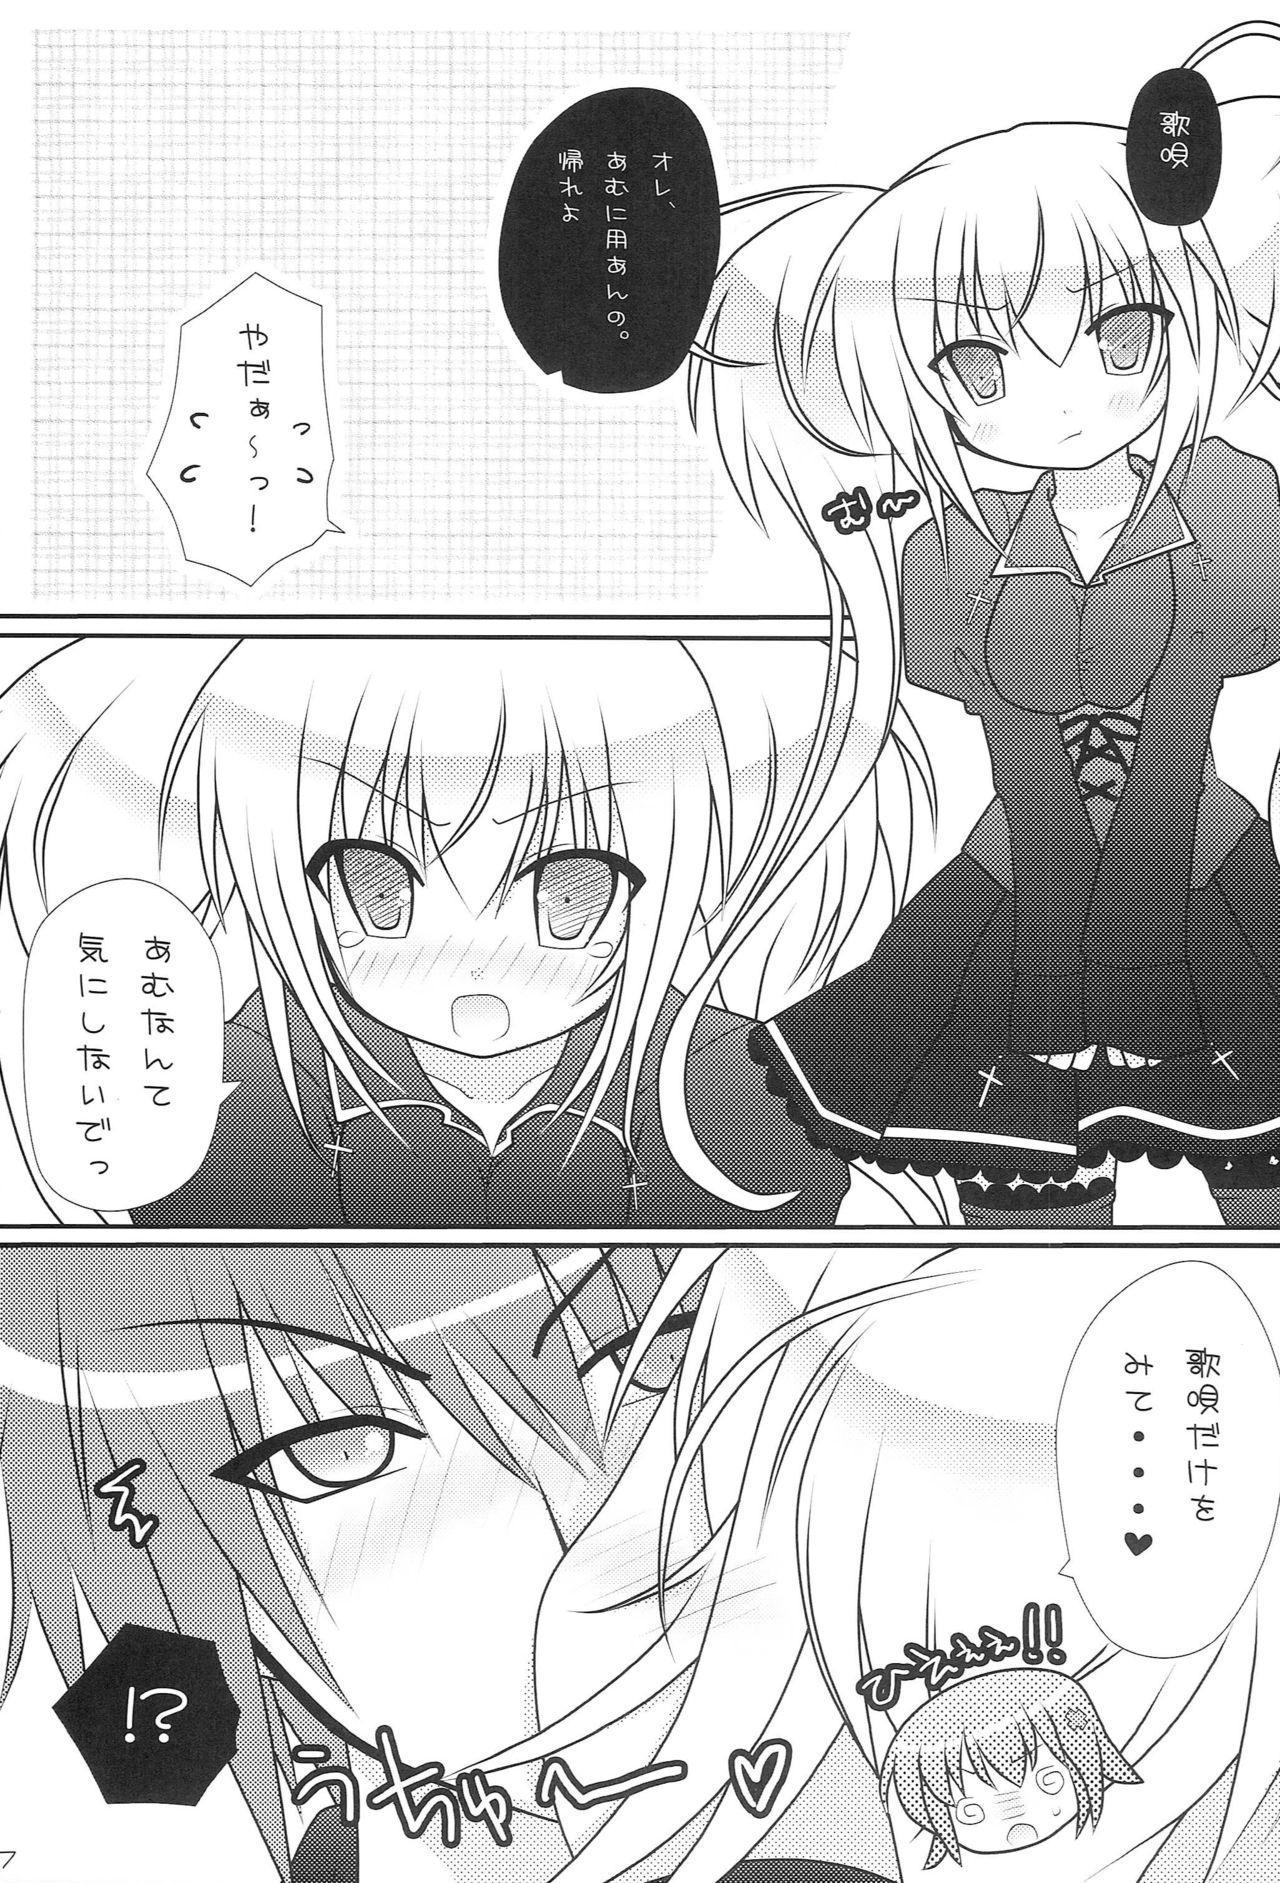 Konomi wa Docchi? 5